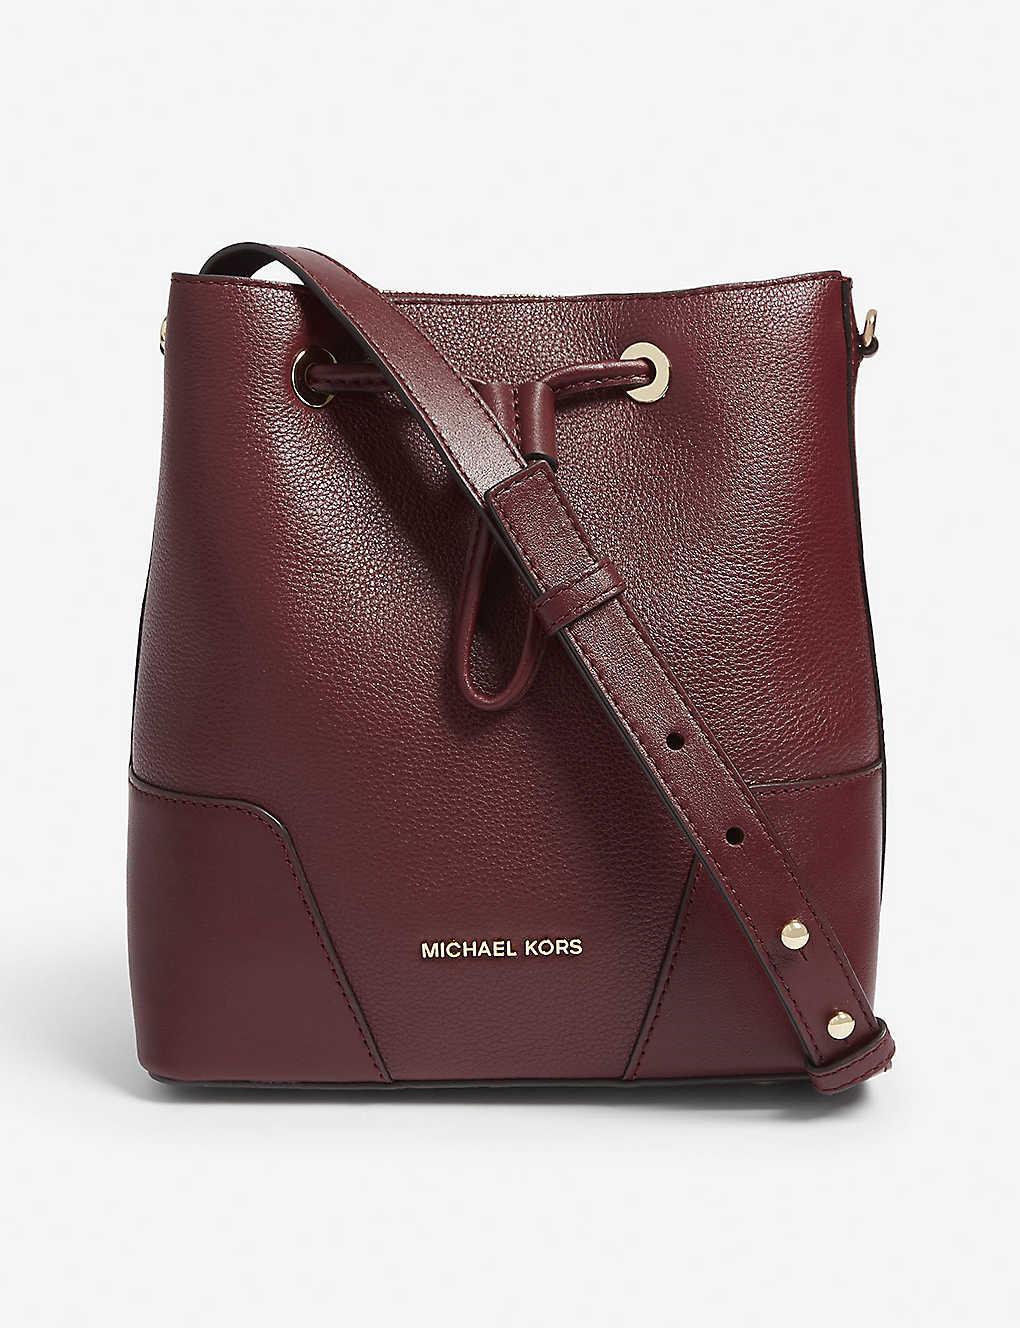 196f185380b6 MICHAEL MICHAEL KORS - Cary leather bucket bag | Selfridges.com